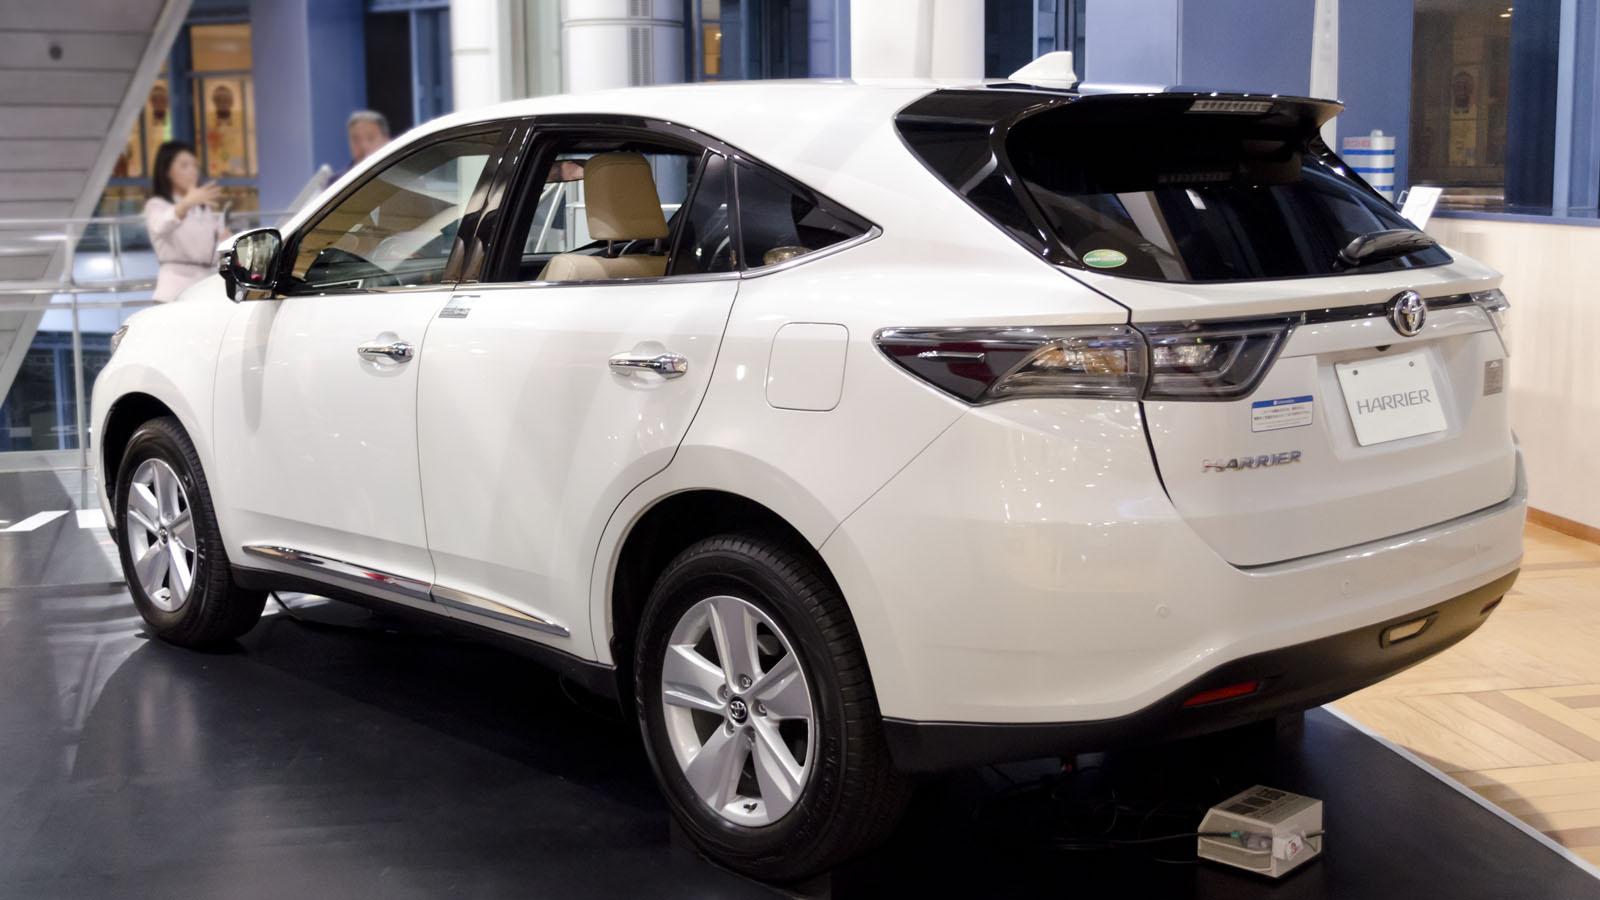 Suv Cars Price In Pakistan